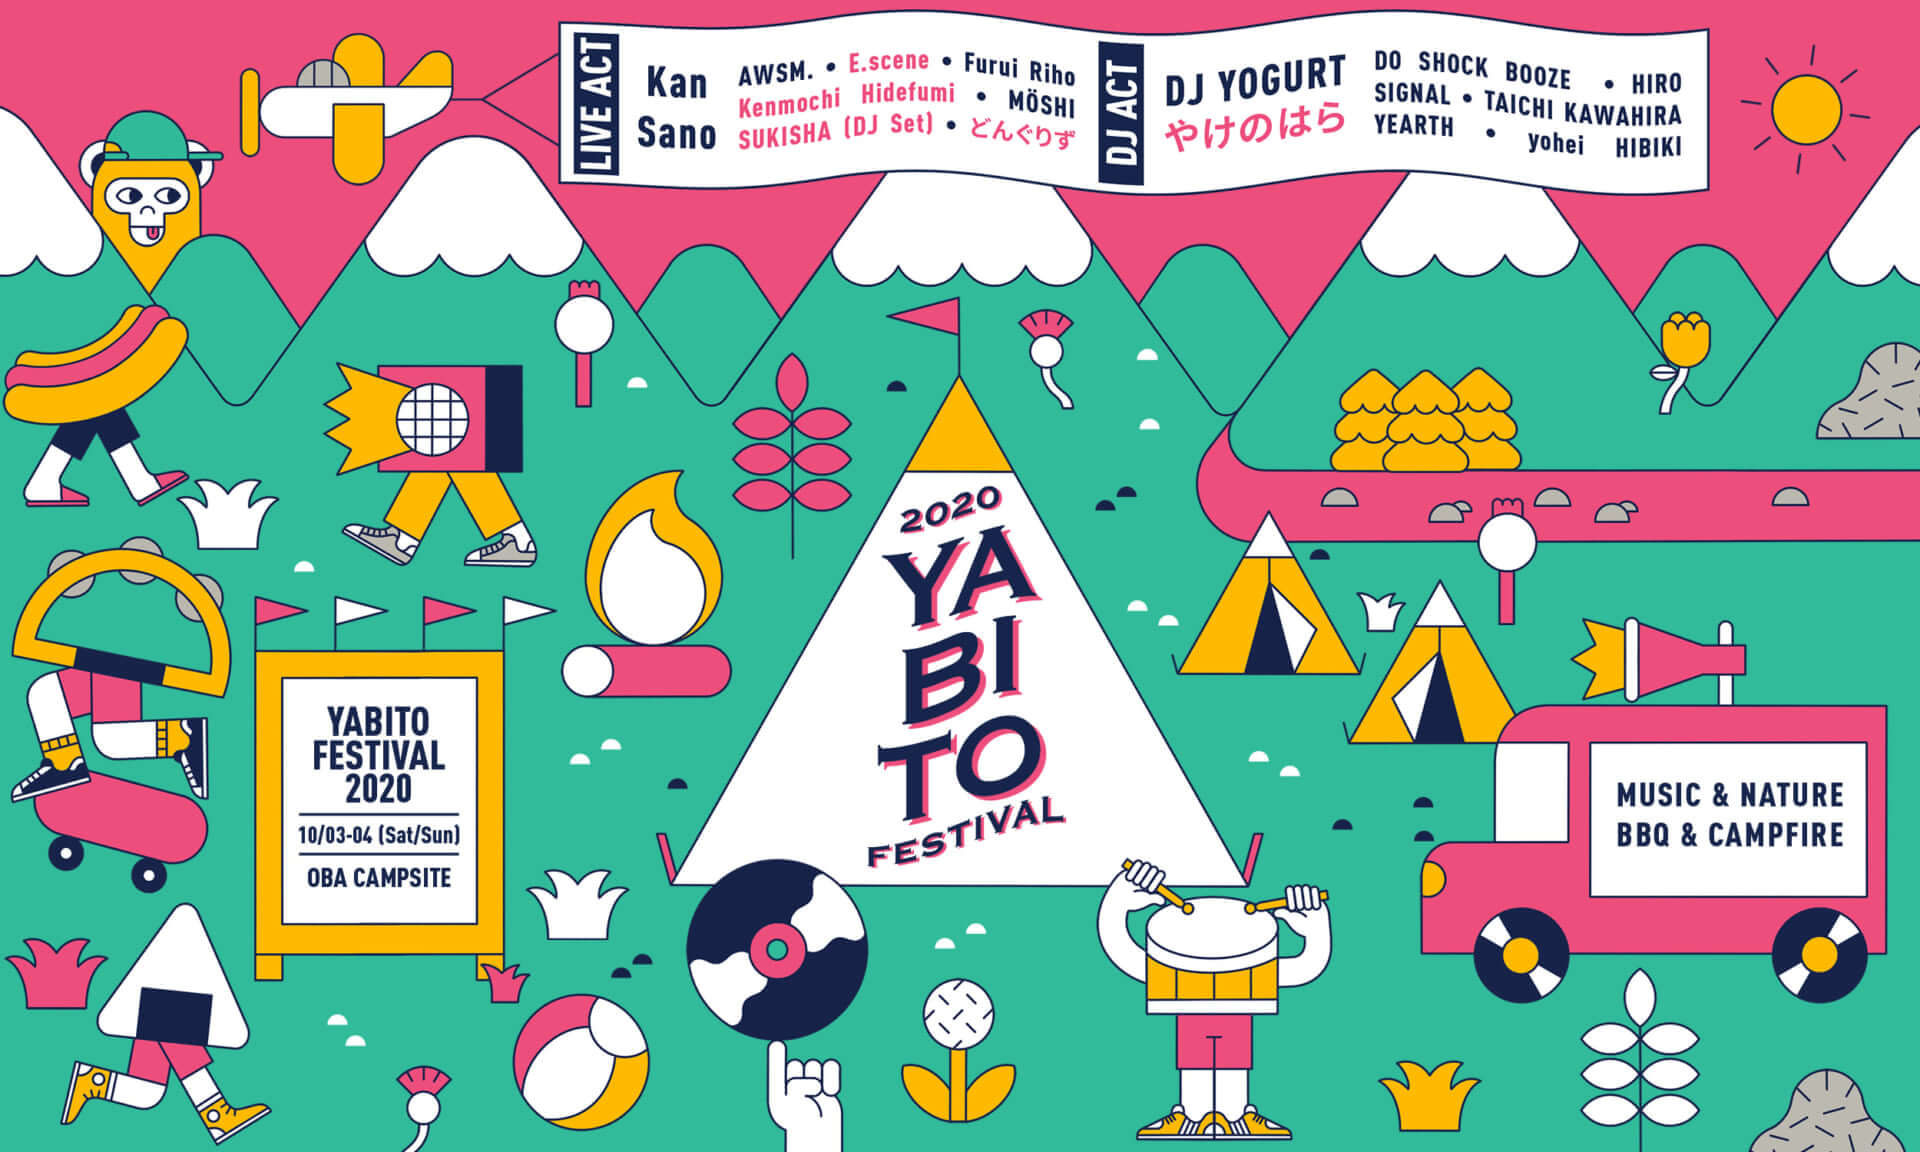 <YABITO FESTIVAL 2020>第2弾出演者が発表!やけのはら、どんぐりず、E.scene、SUKISHA、Kenmochi Hidefumiもラインナップ music200917_yabitofestival_1-1920x1152